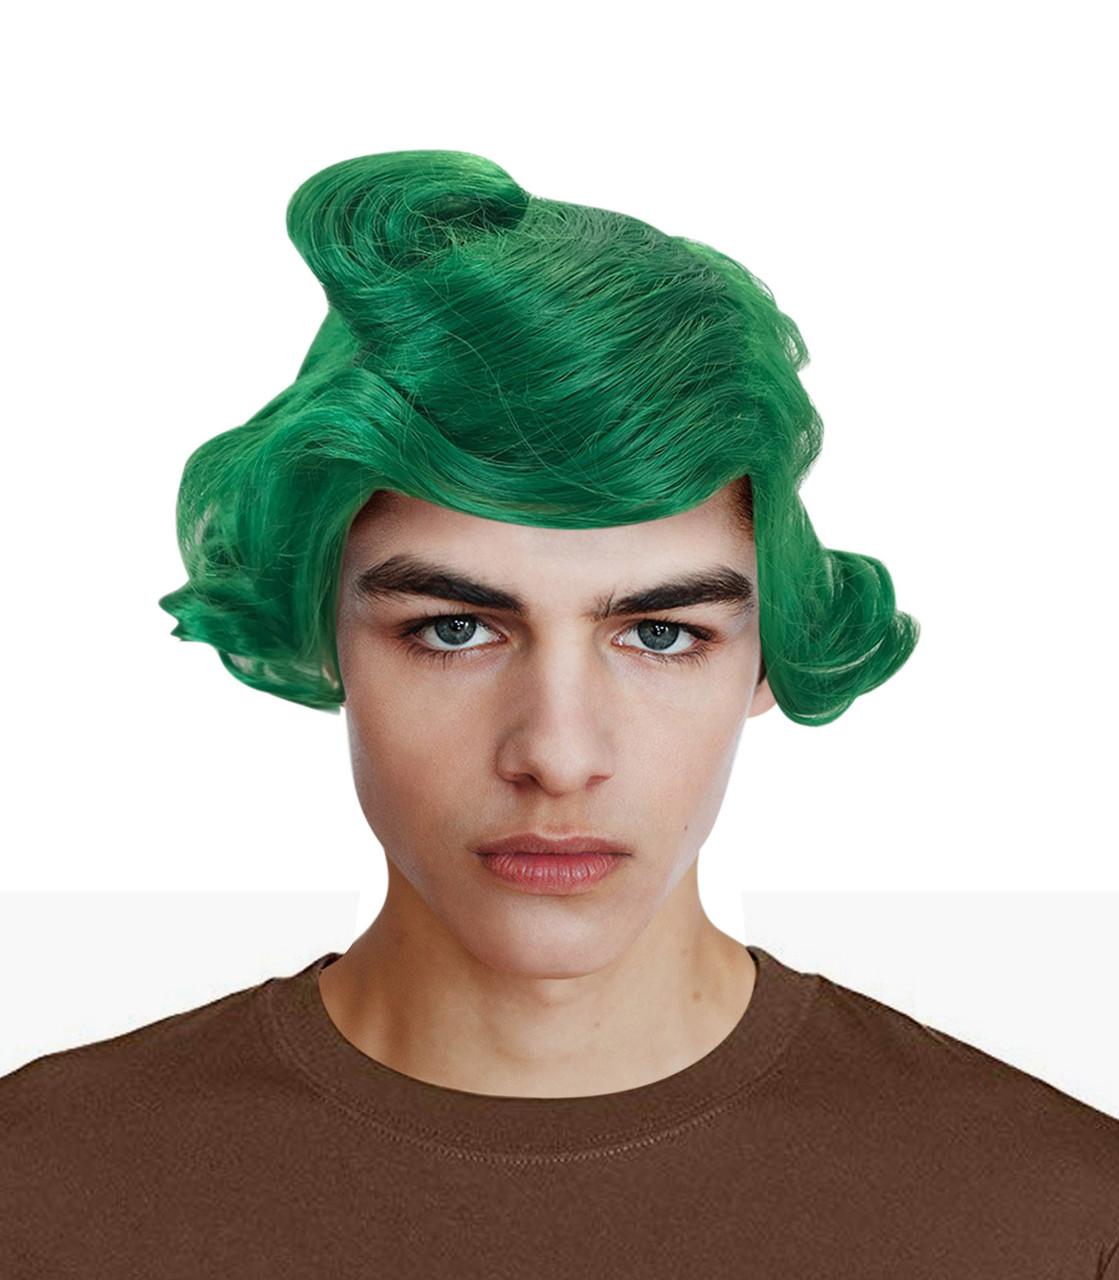 Oompa Loompa Green Wig Willy Wonka Chocolate Costume